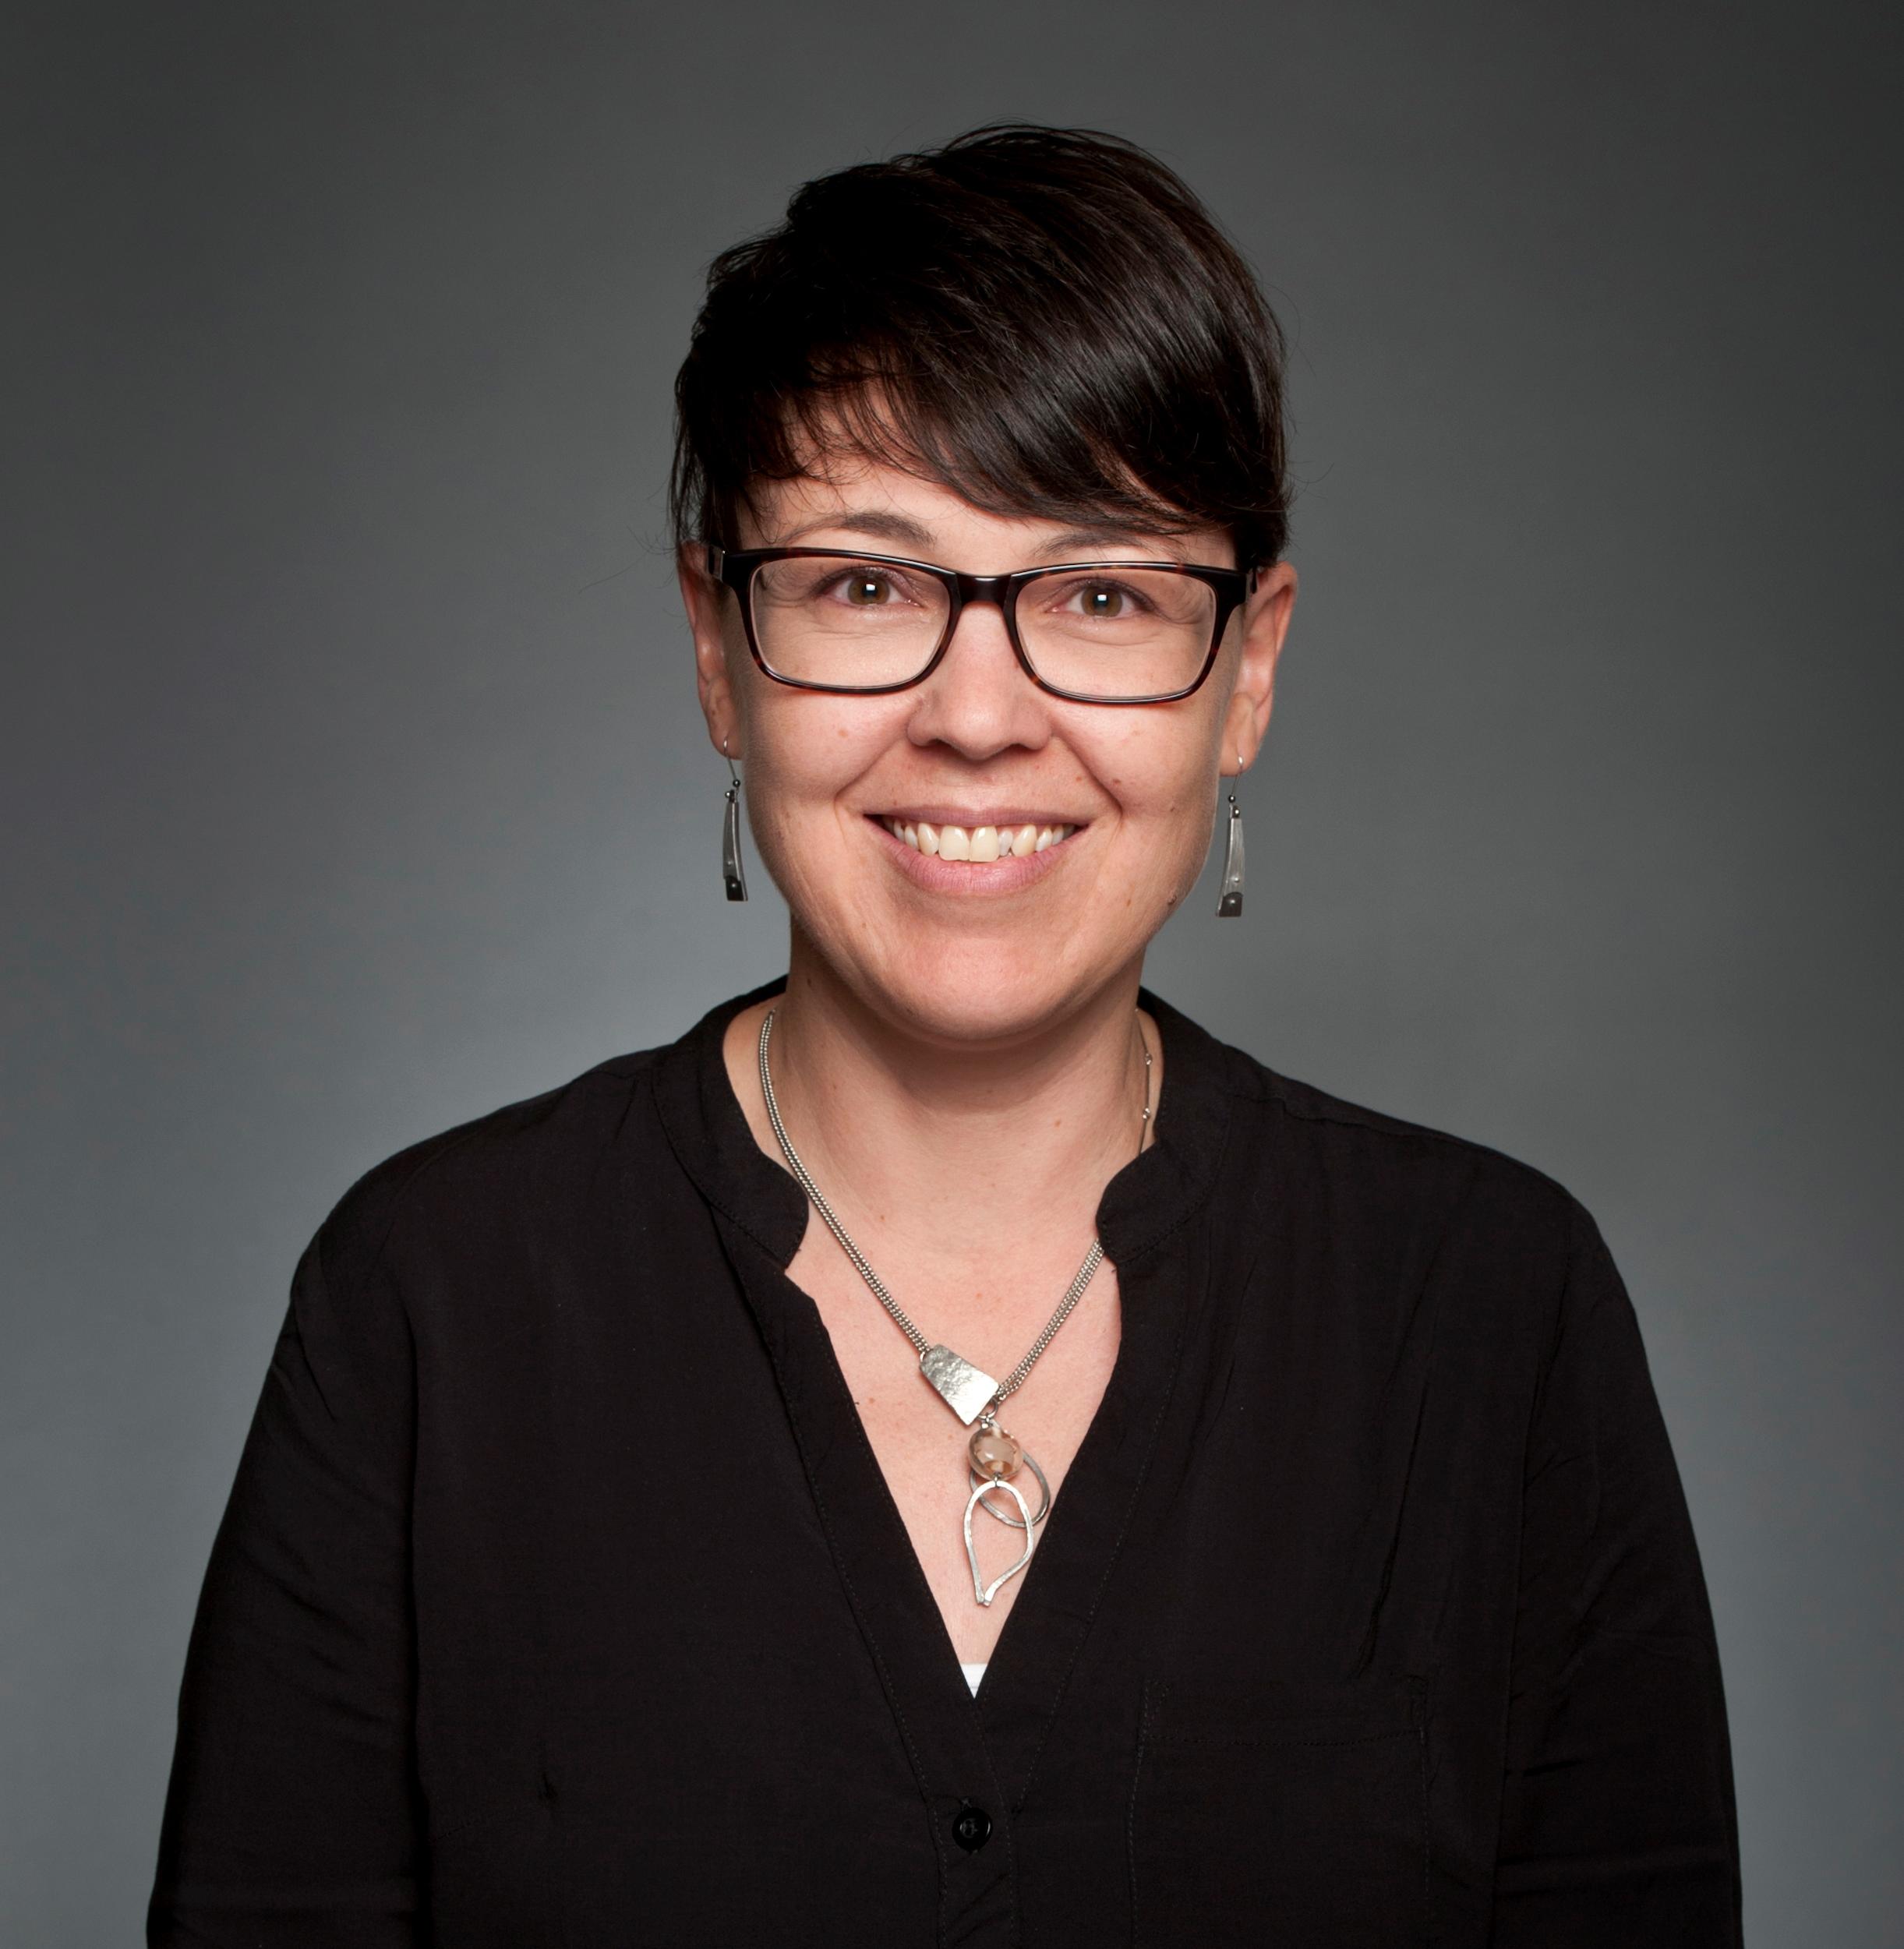 Caroline Faucher - Communications Officer, HRREC   Agente de communications, CREDP